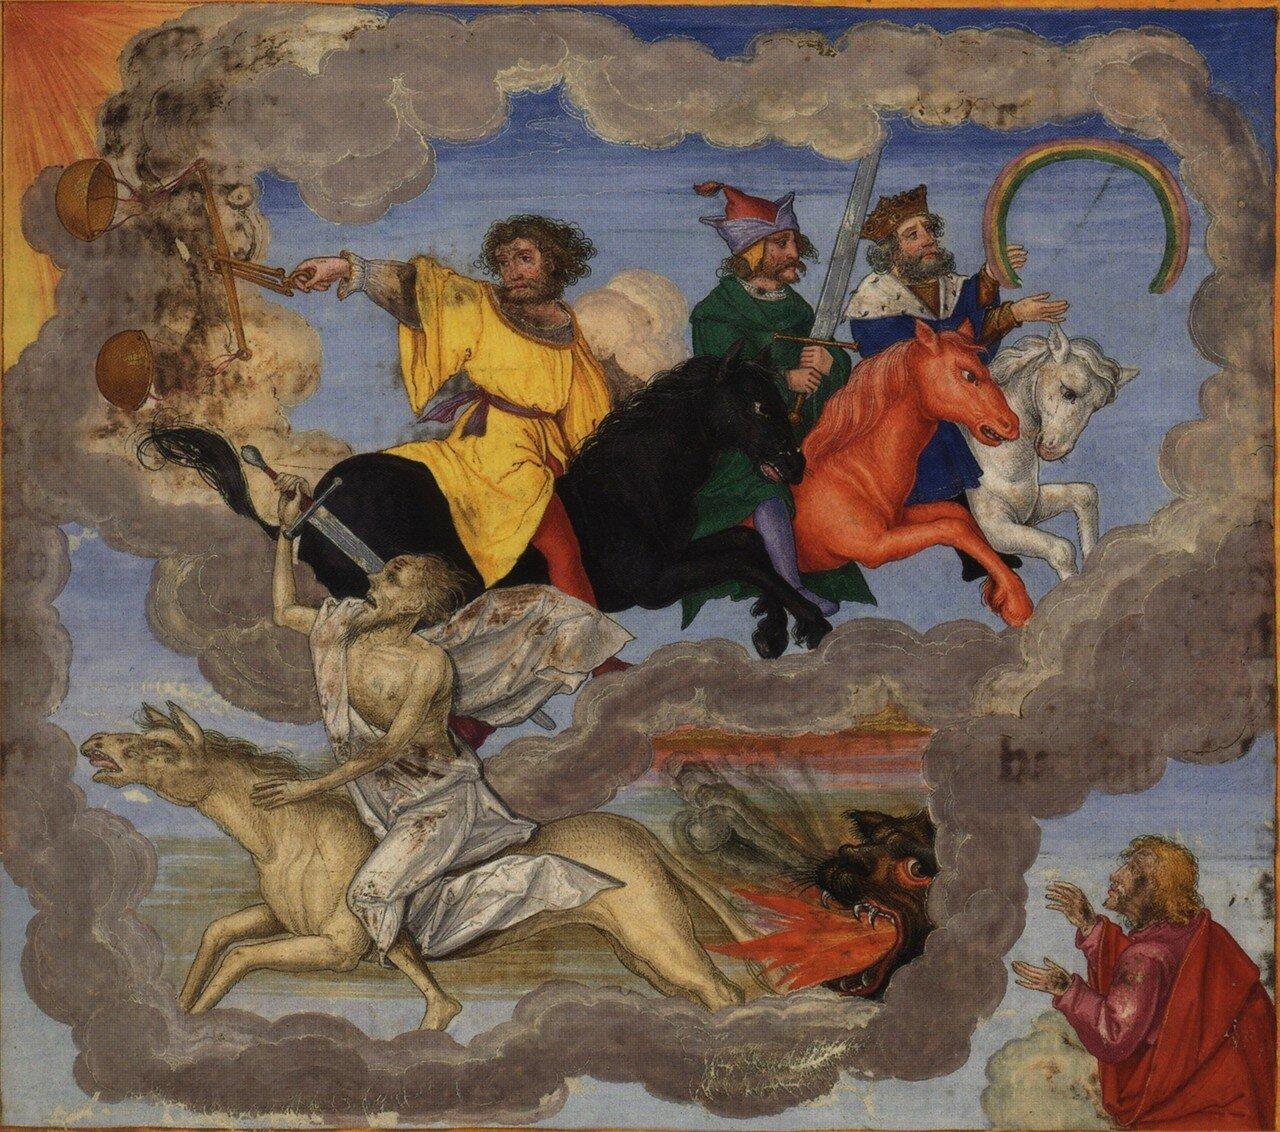 Ottheinrich_Folio288r_Rev6A.jpg